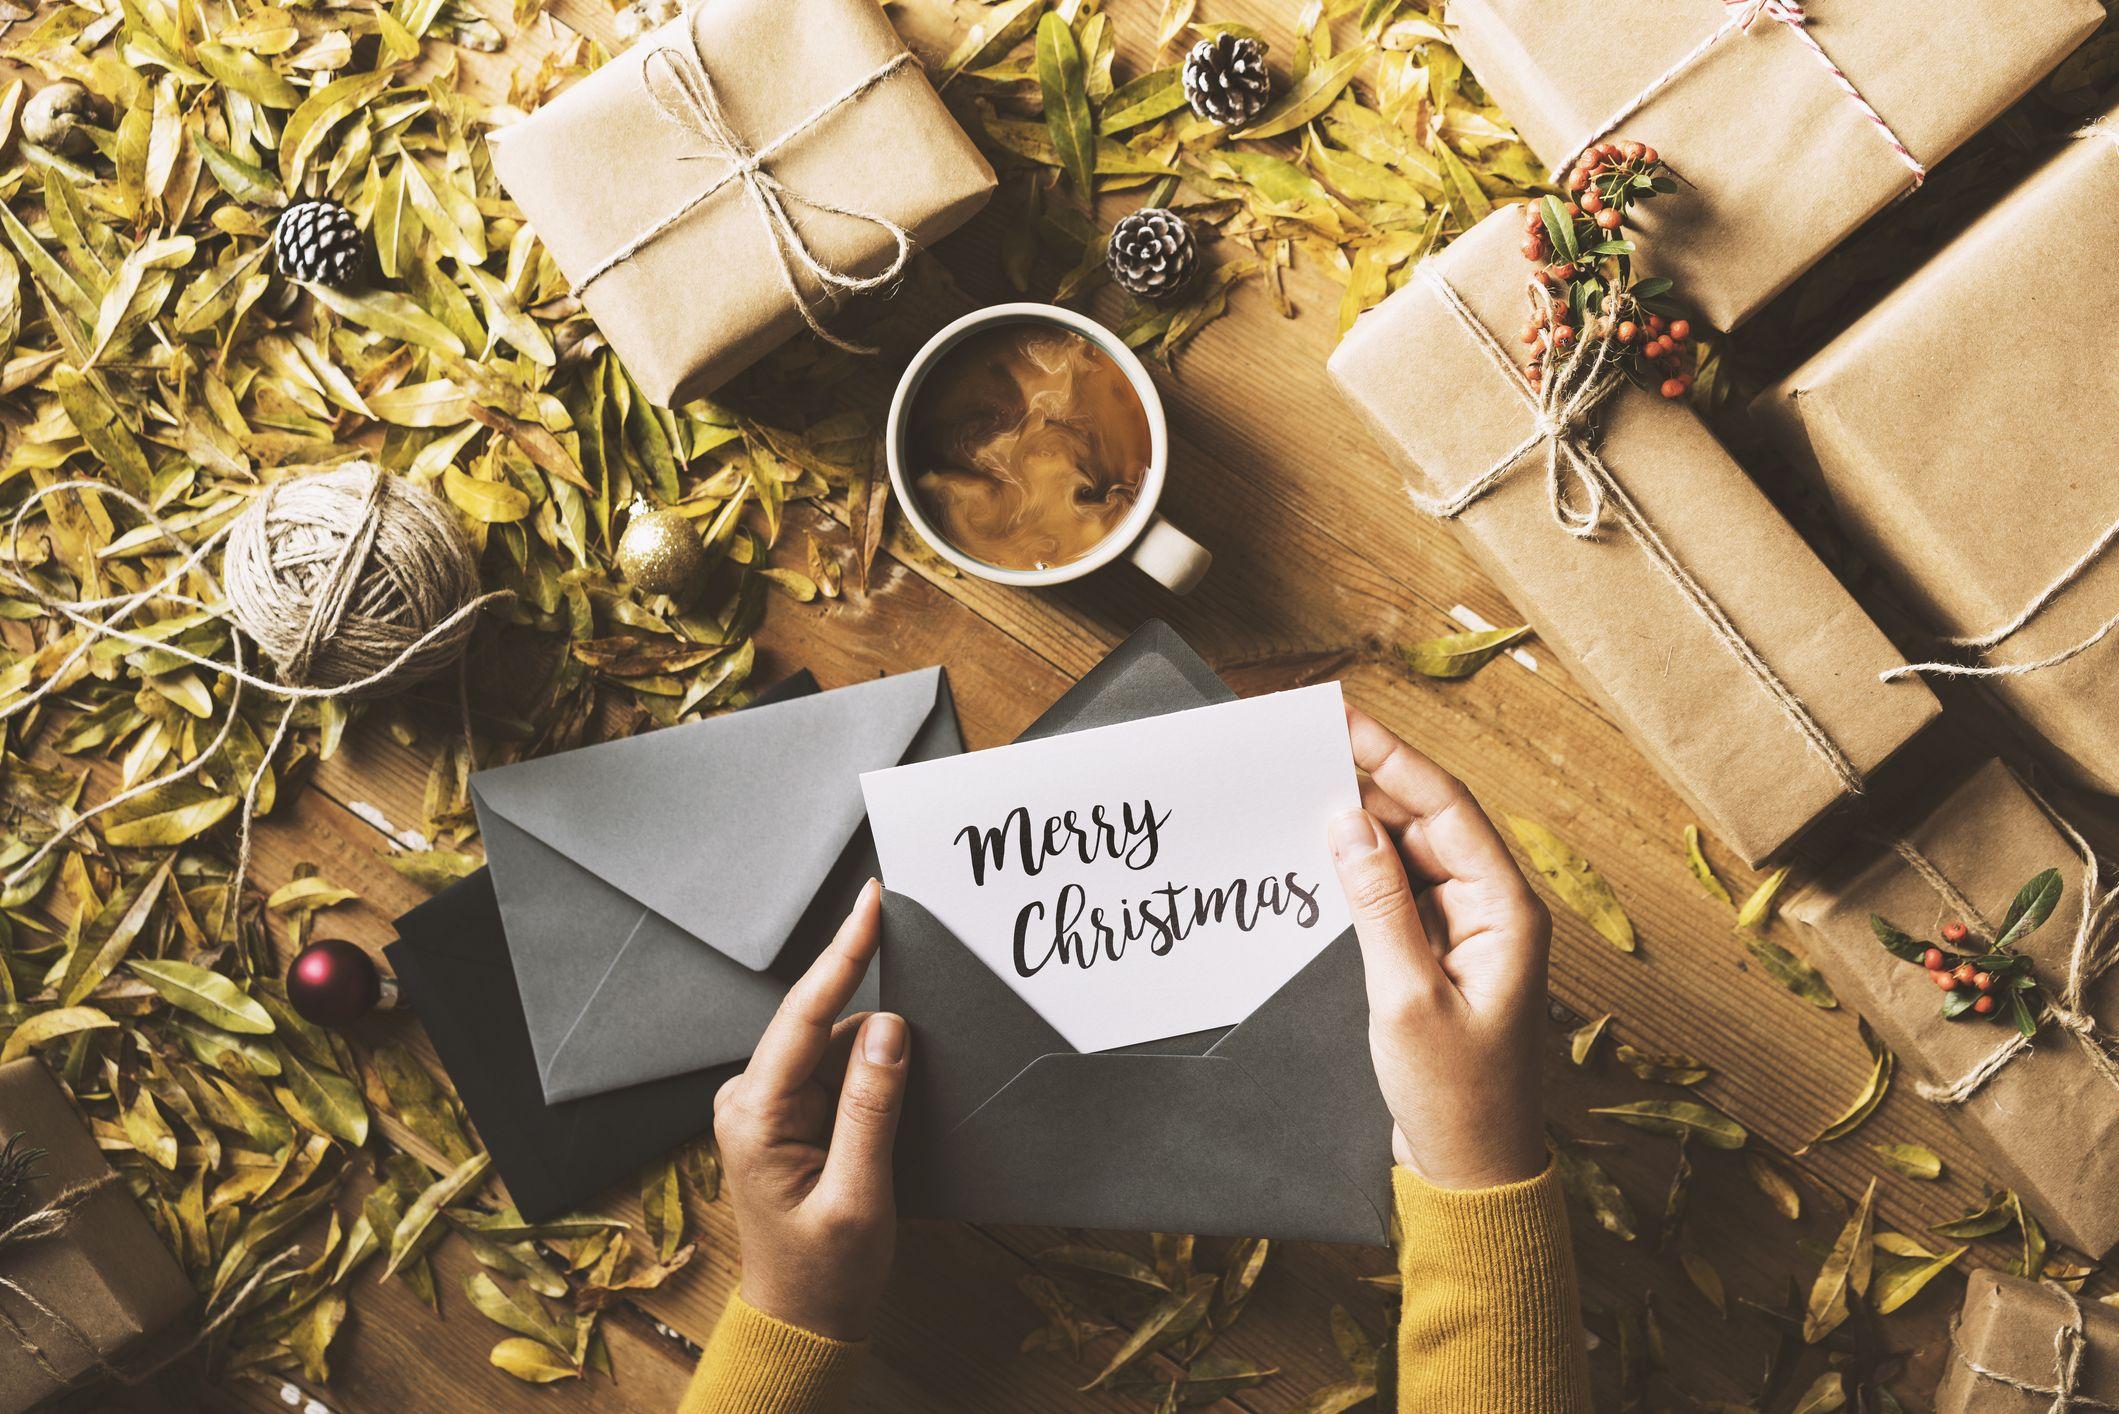 Origin of 'Merry Christmas' — Why We